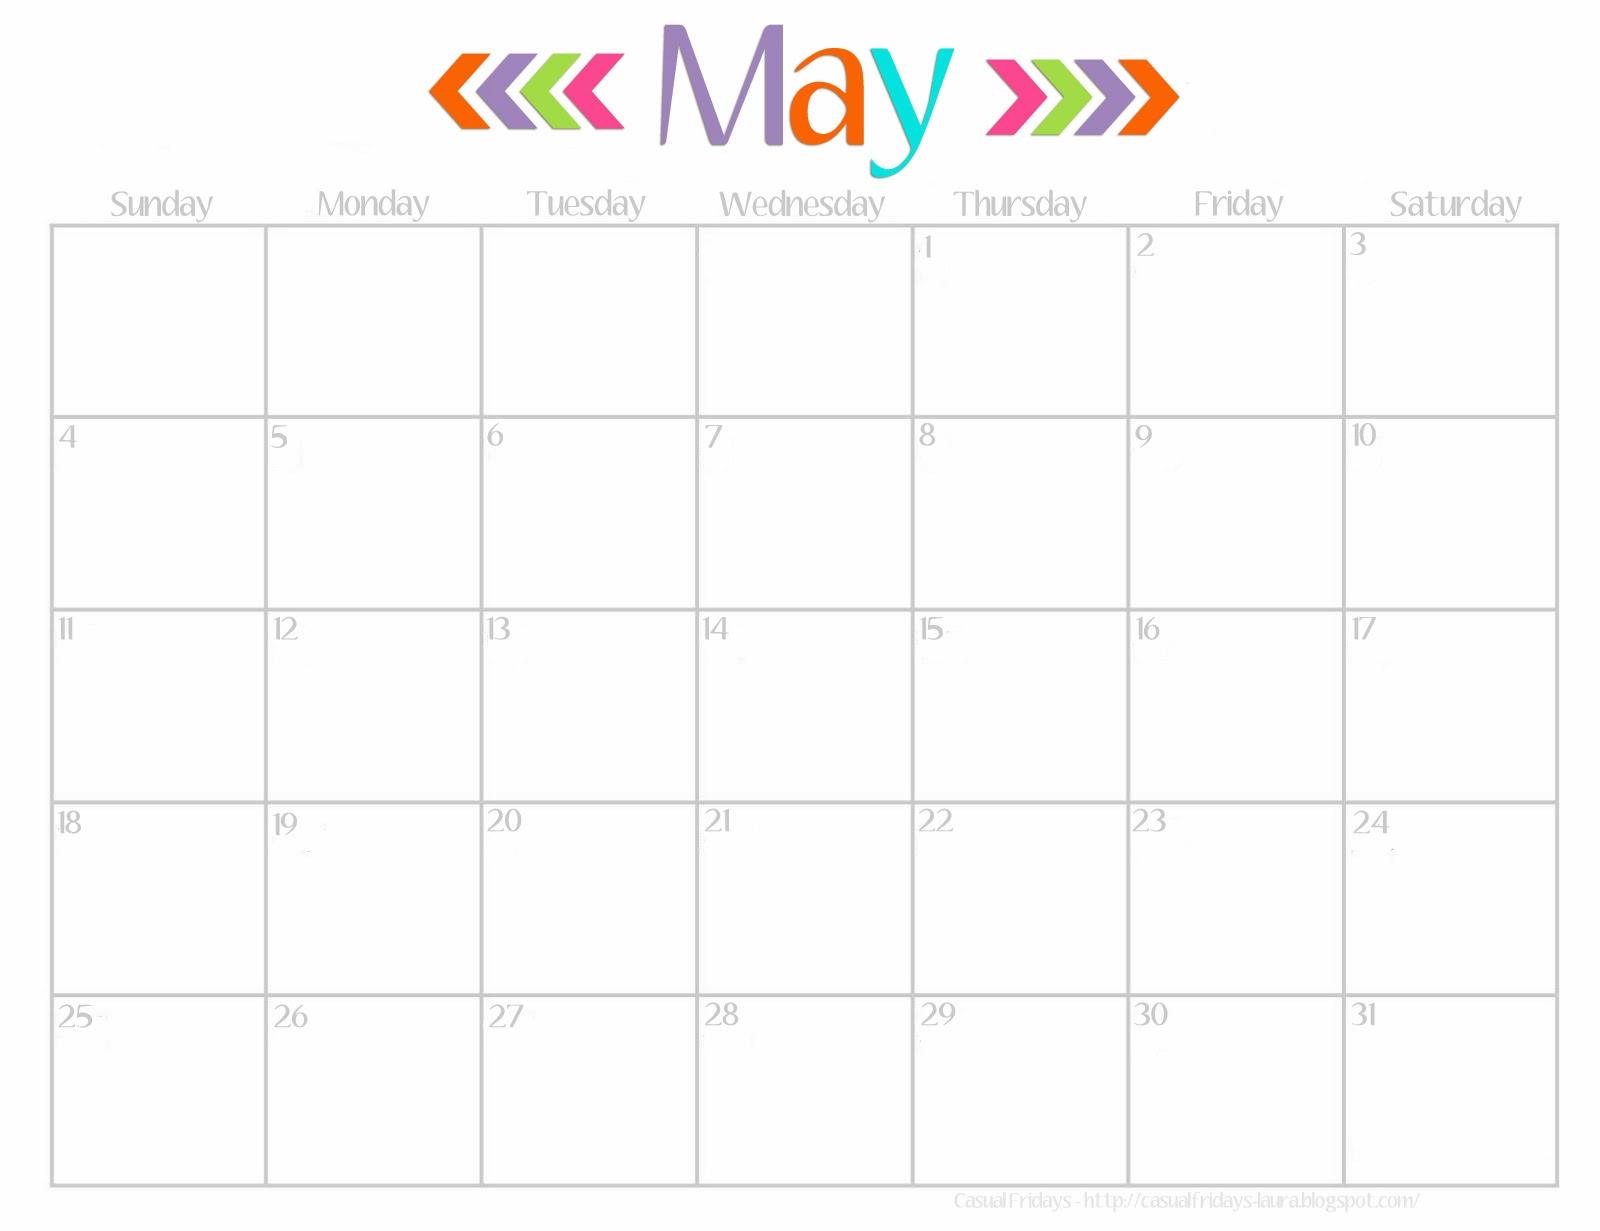 May Calendar Cute : Casual fridays free printable calendar